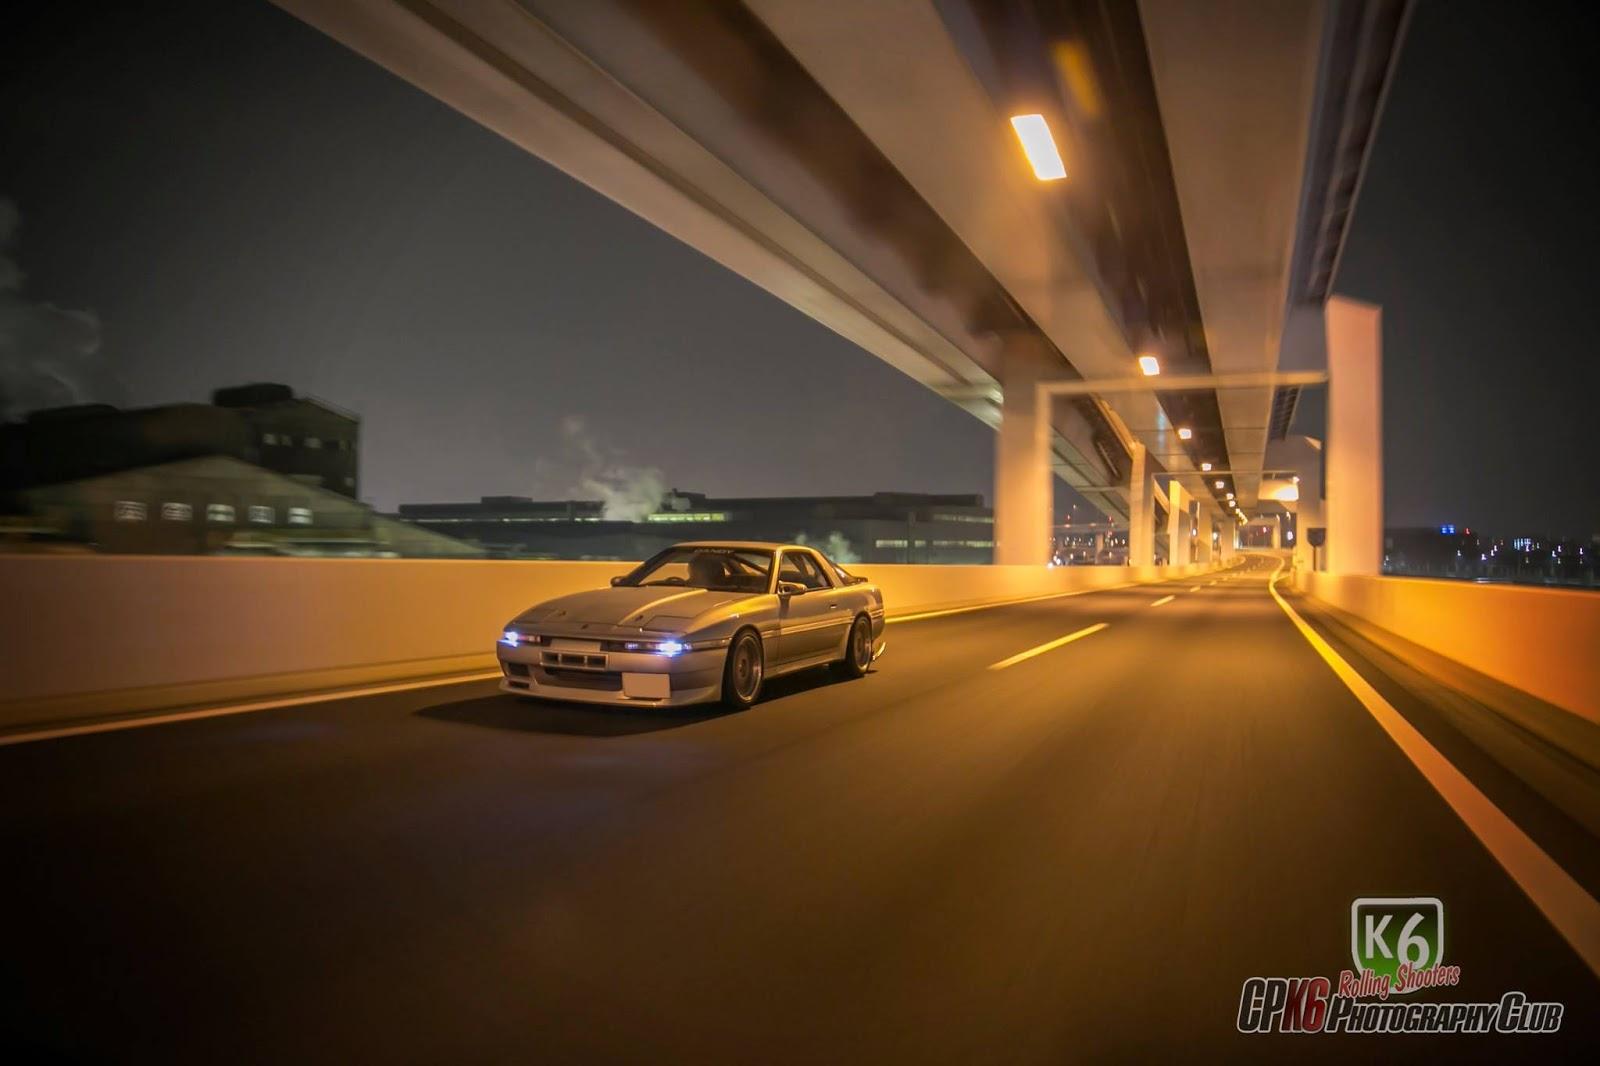 Toyota Supra A70 MK3, japońska ikona motoryzacji, znany samochód, motoryzacja z lat 80, JDM, sportowe auto, znane, kultowe, tuning